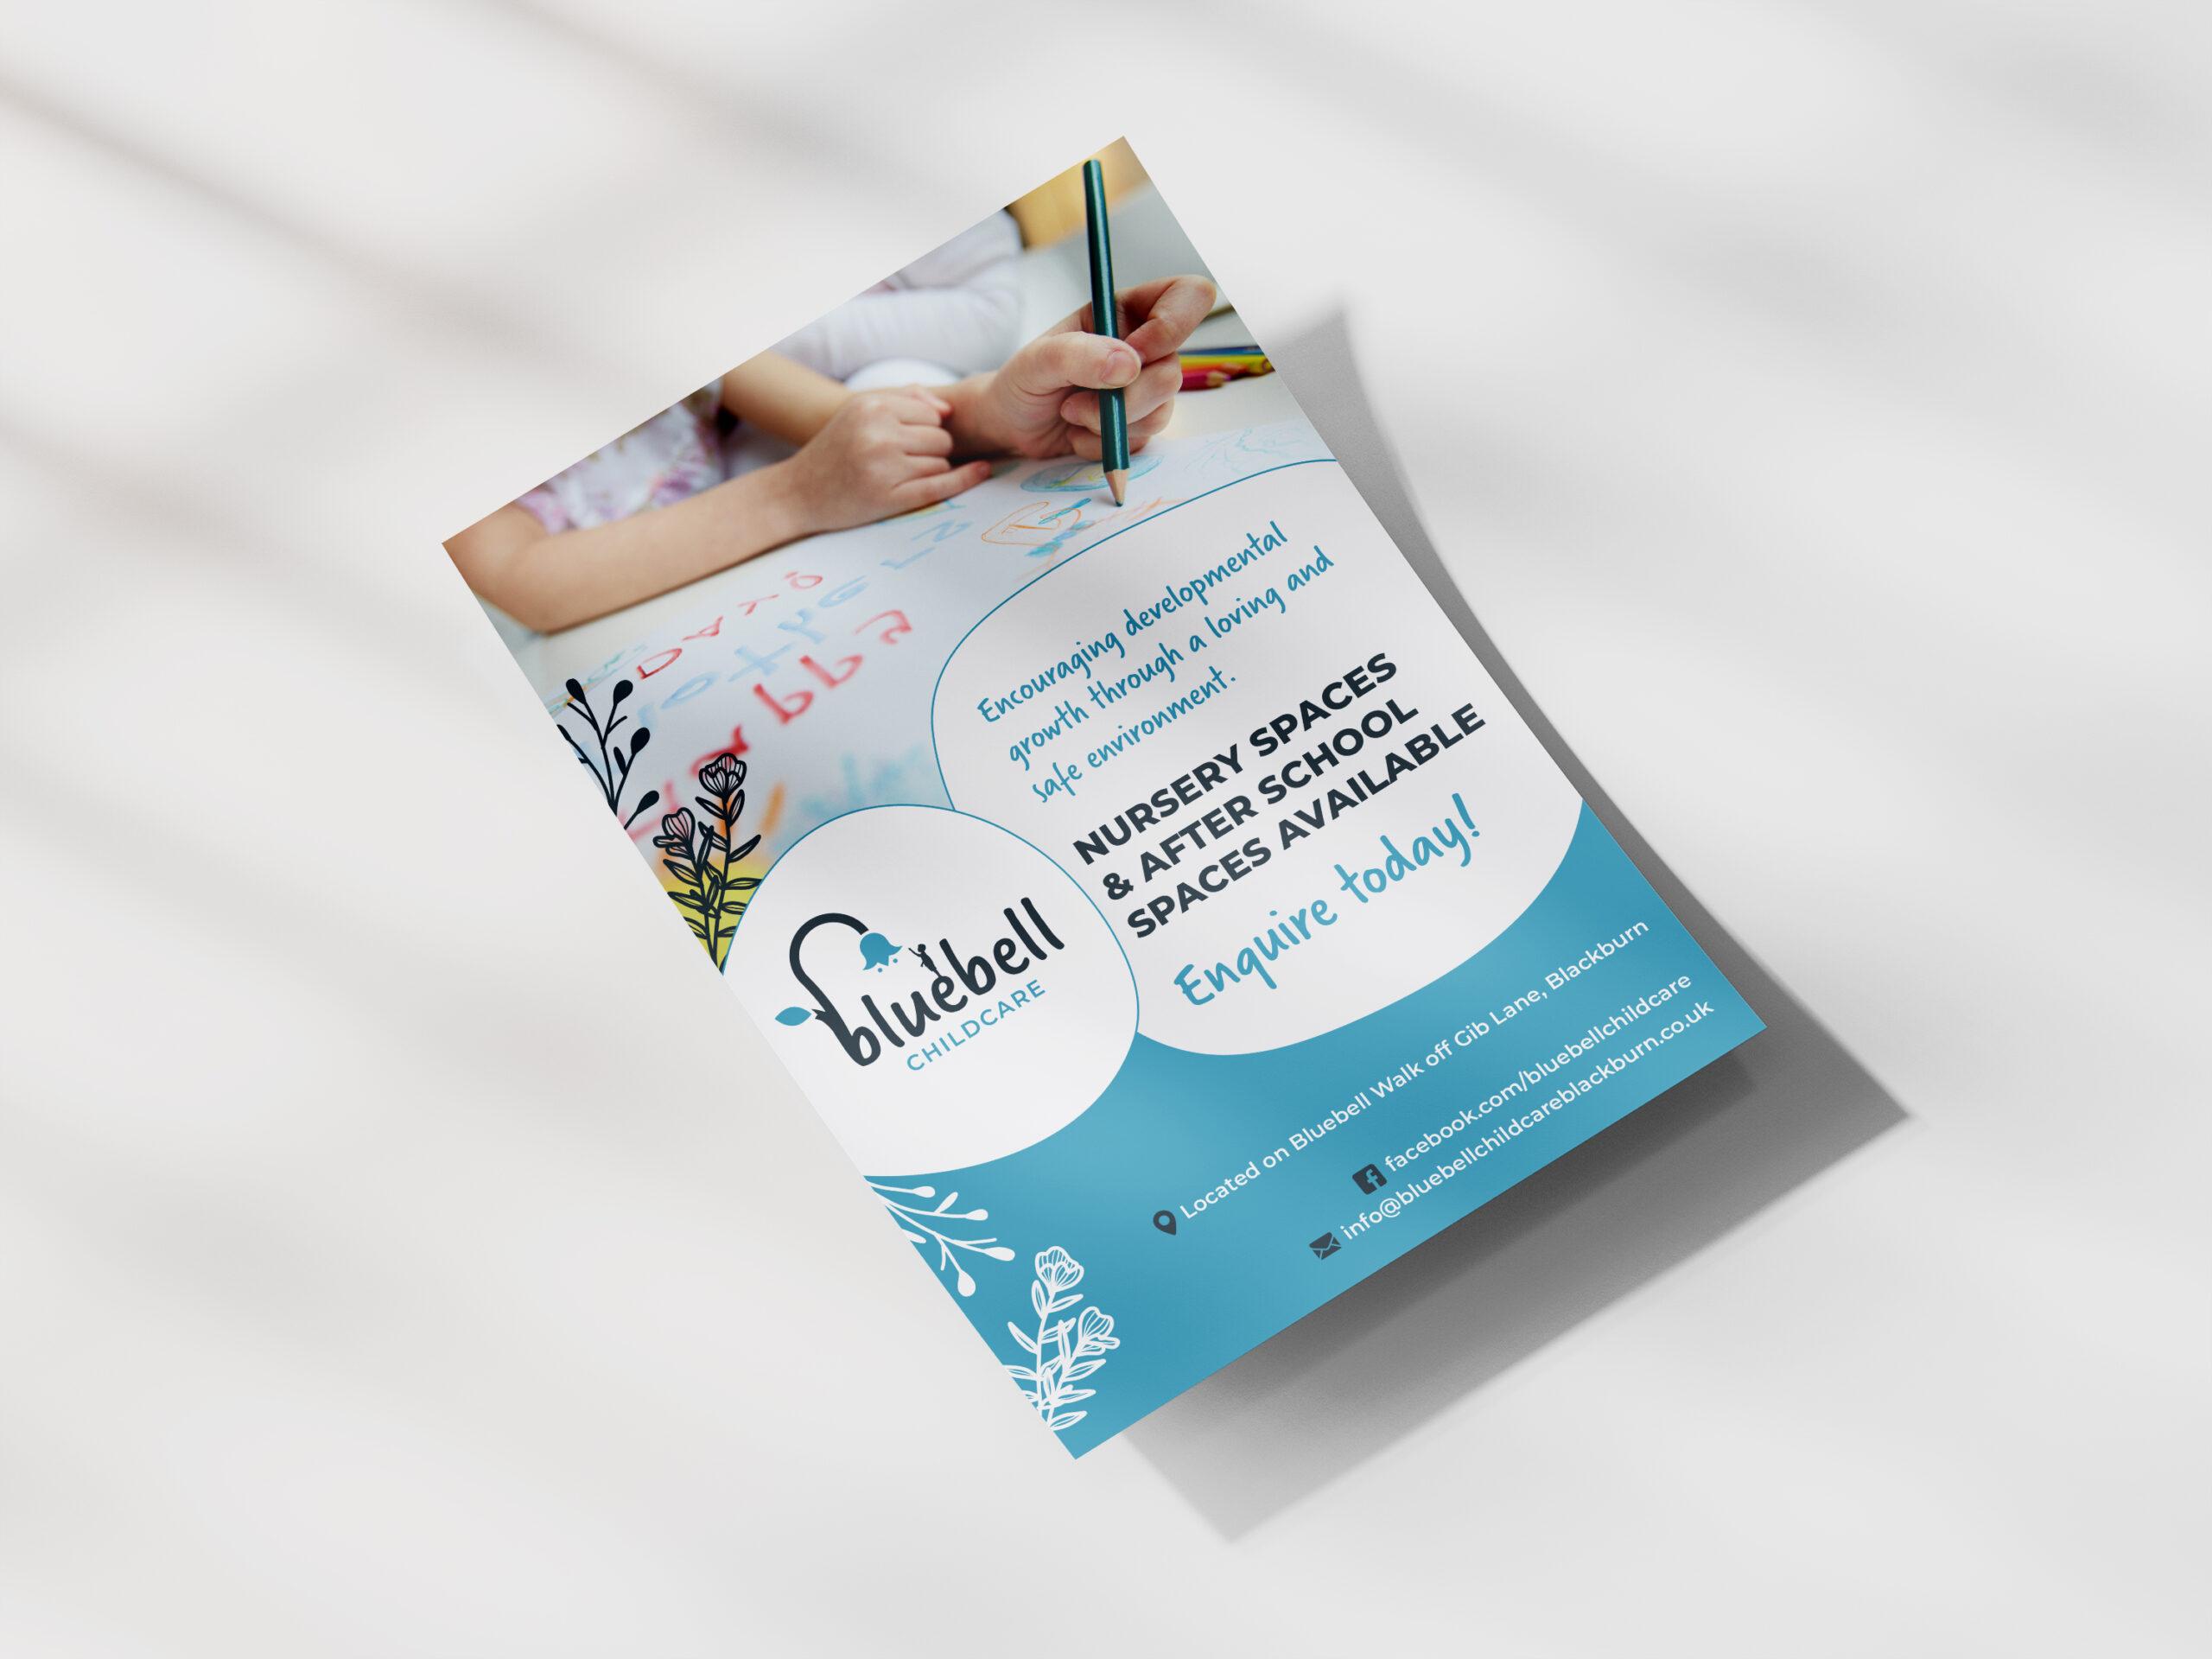 Bluebell Childcare leaflet design by Very Vivid Graphic Designer.